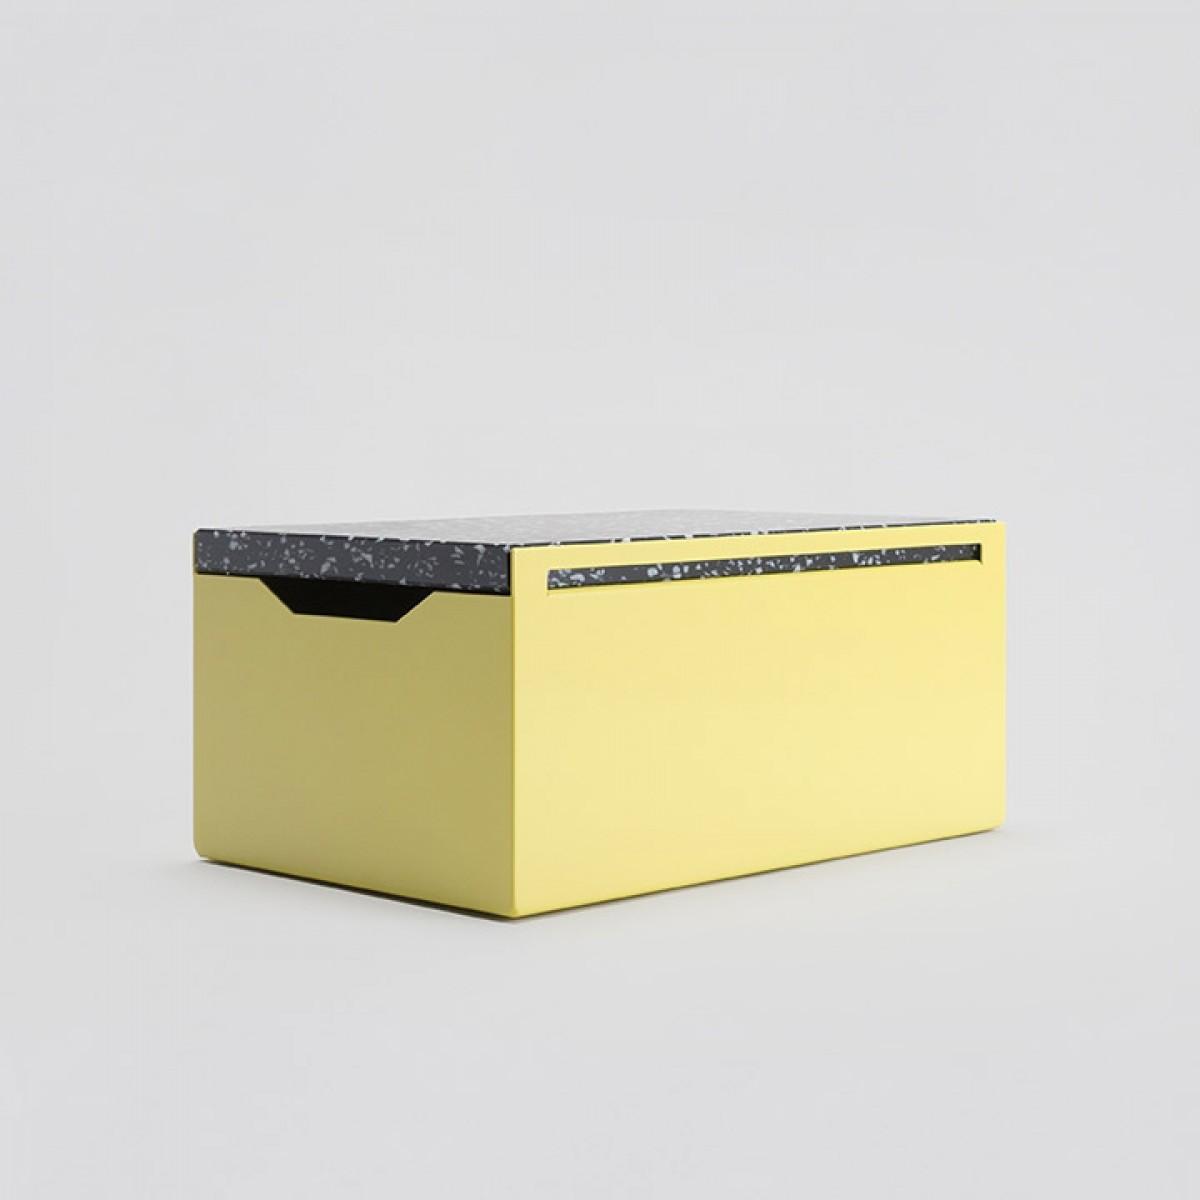 BREAD BOX / Brotkasten aus Stahlblech (Stracciatella Edition)